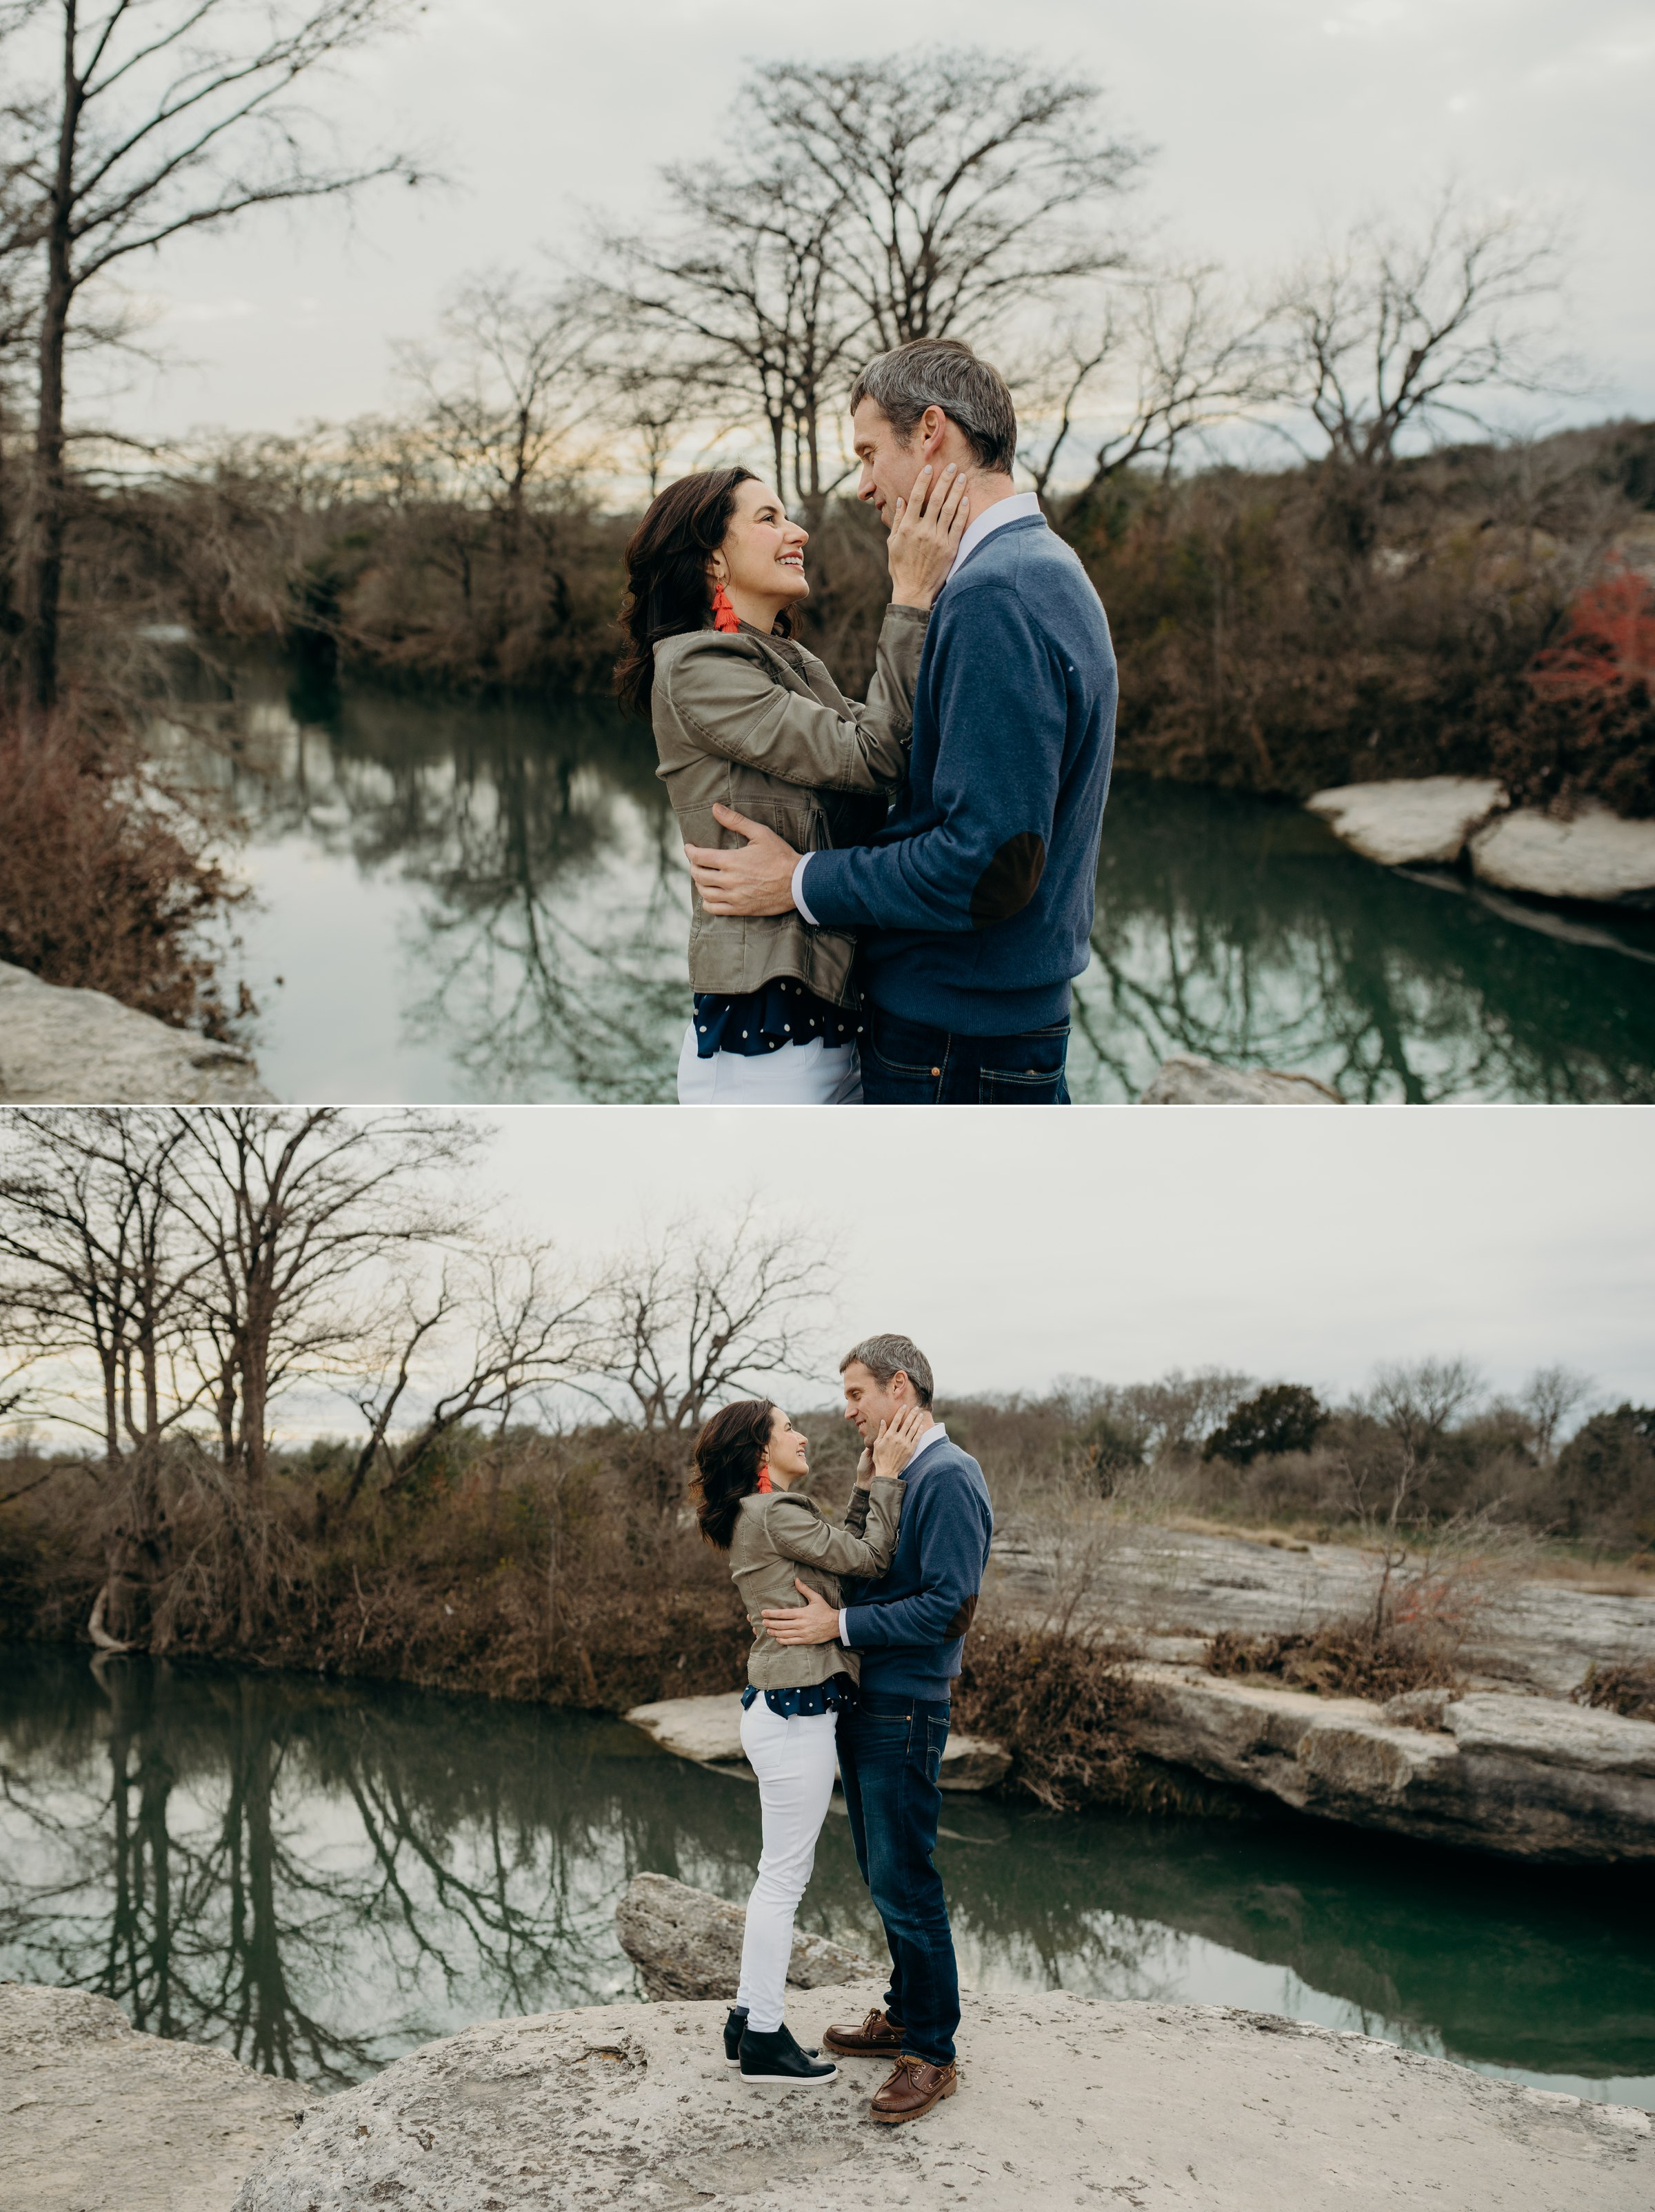 austin-mckinney-falls-engagement-photographer-elopement-prices-best-headshot-senior-adventurous-italy-minneapolis-texas-minnesota-dallas-houston-tulum-mexico_0031.jpg